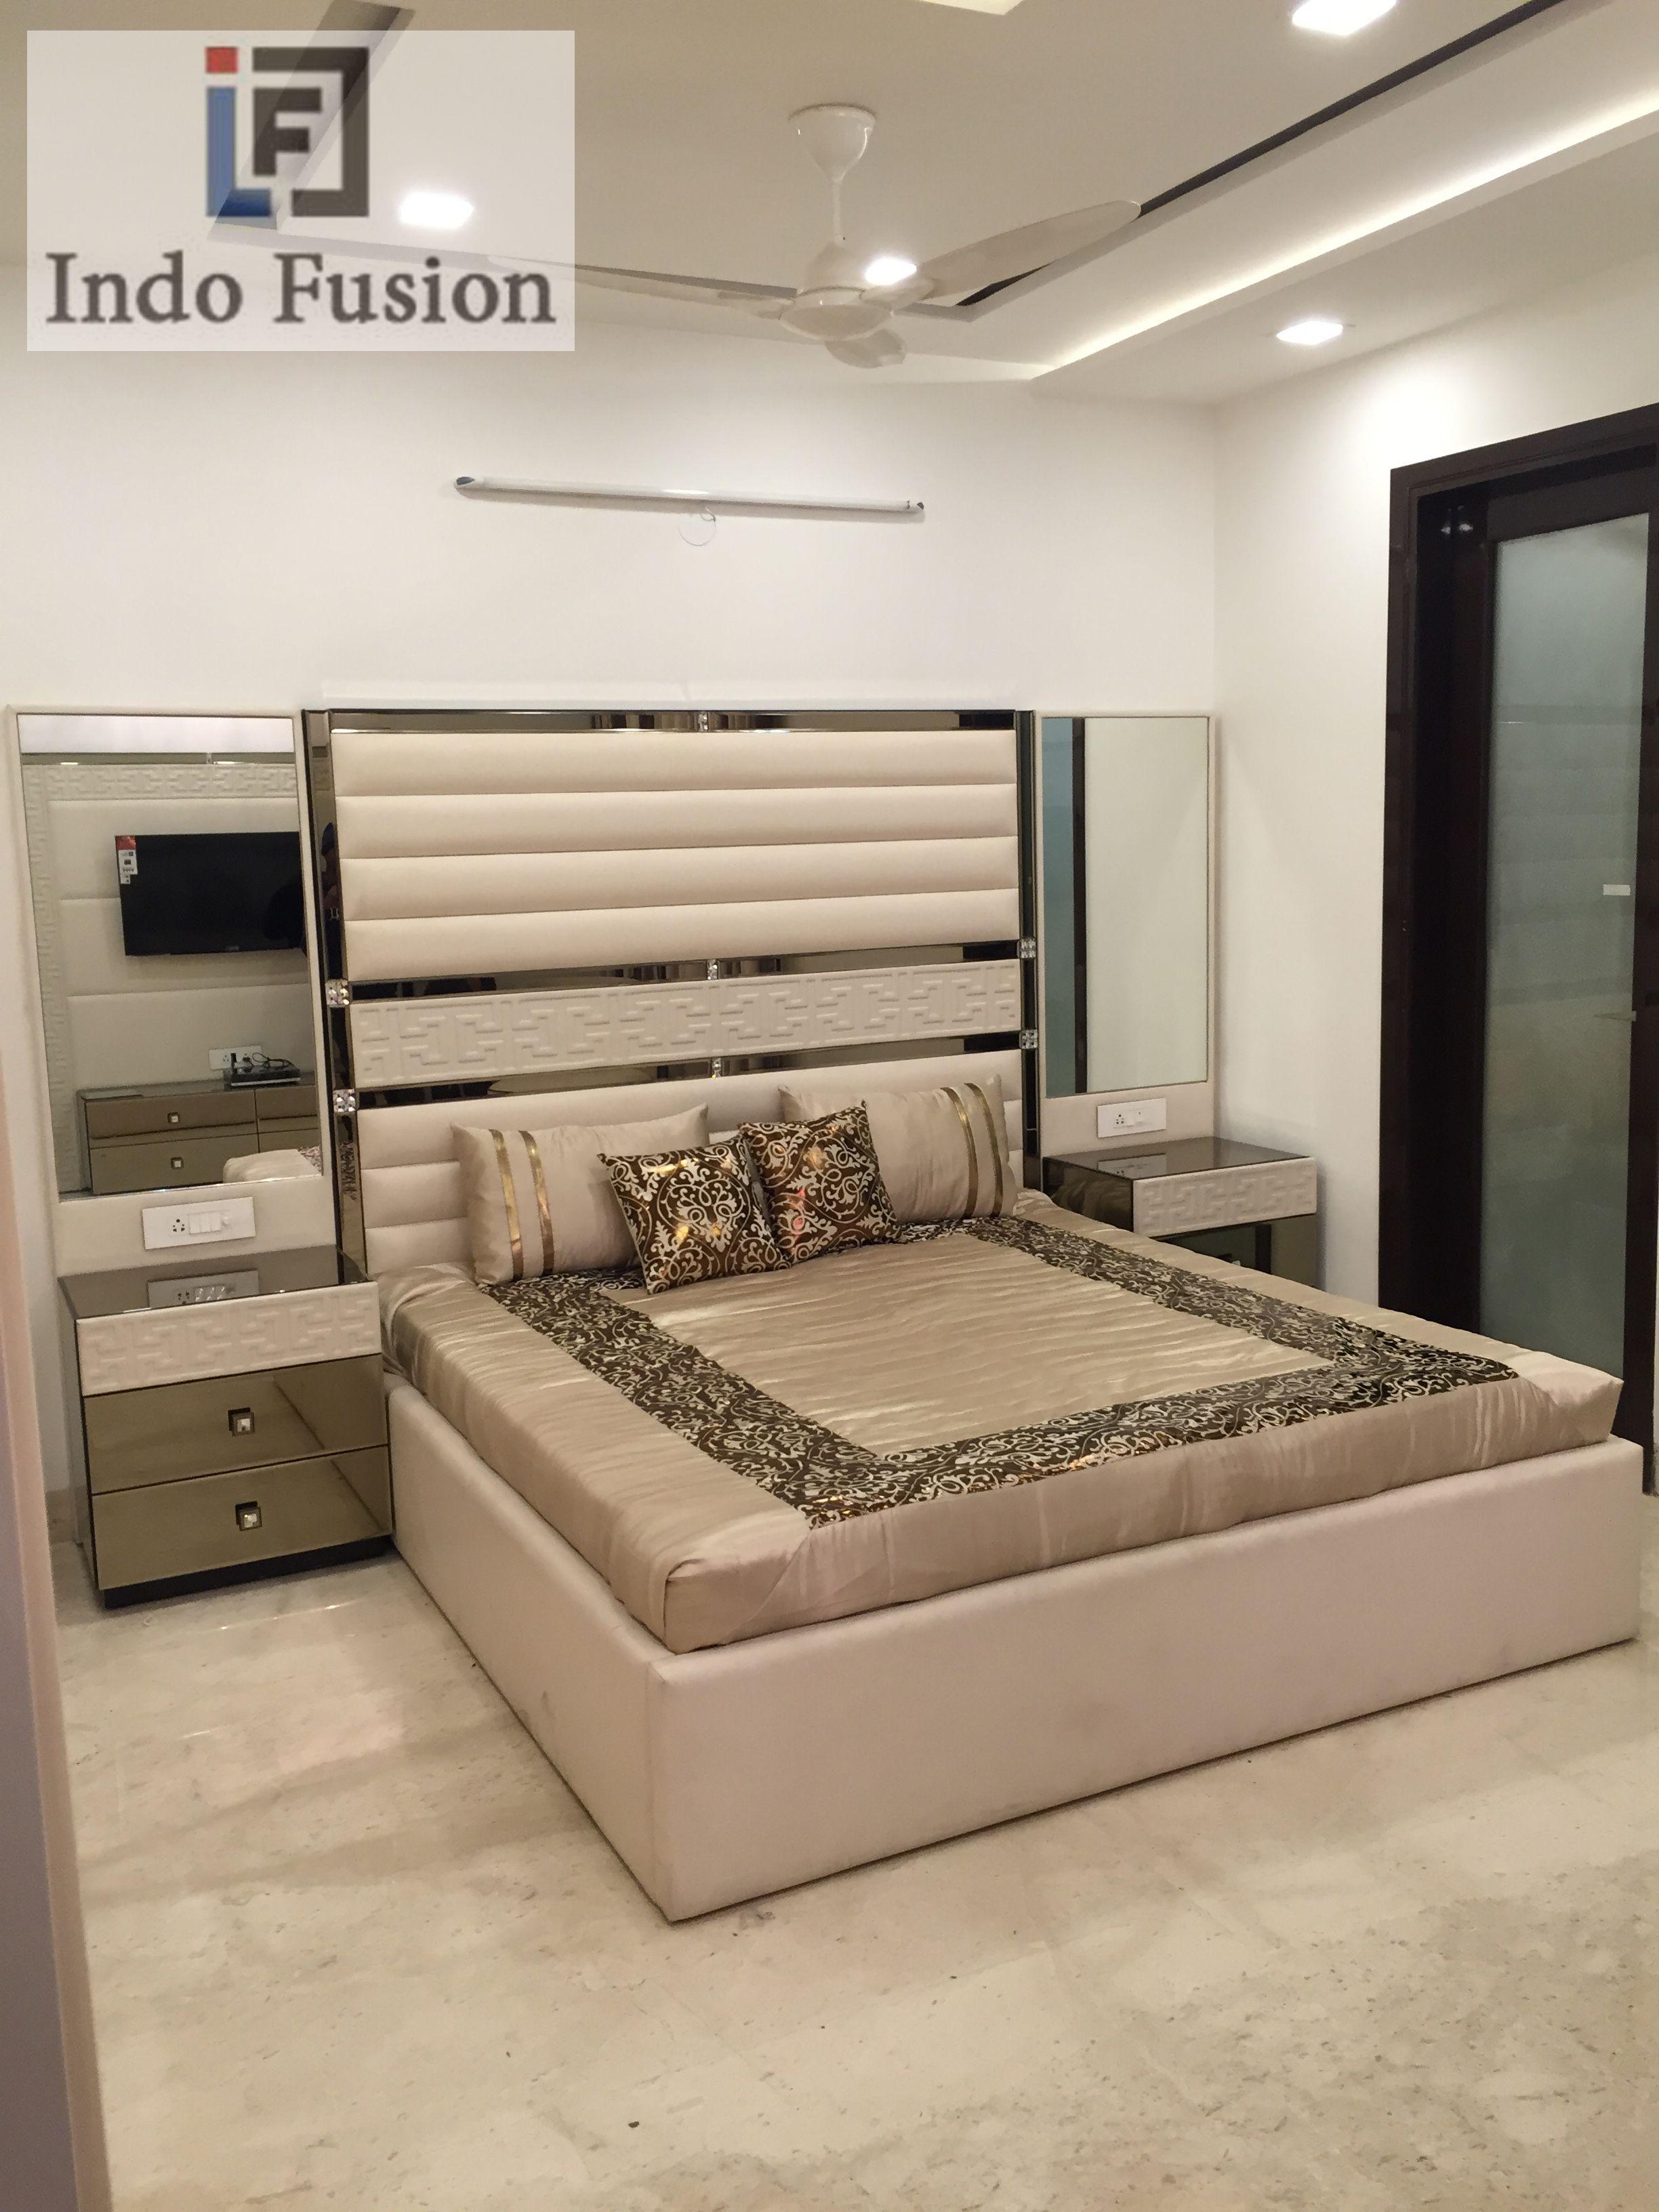 Designer Bed Design By Indo Fusion Interiors